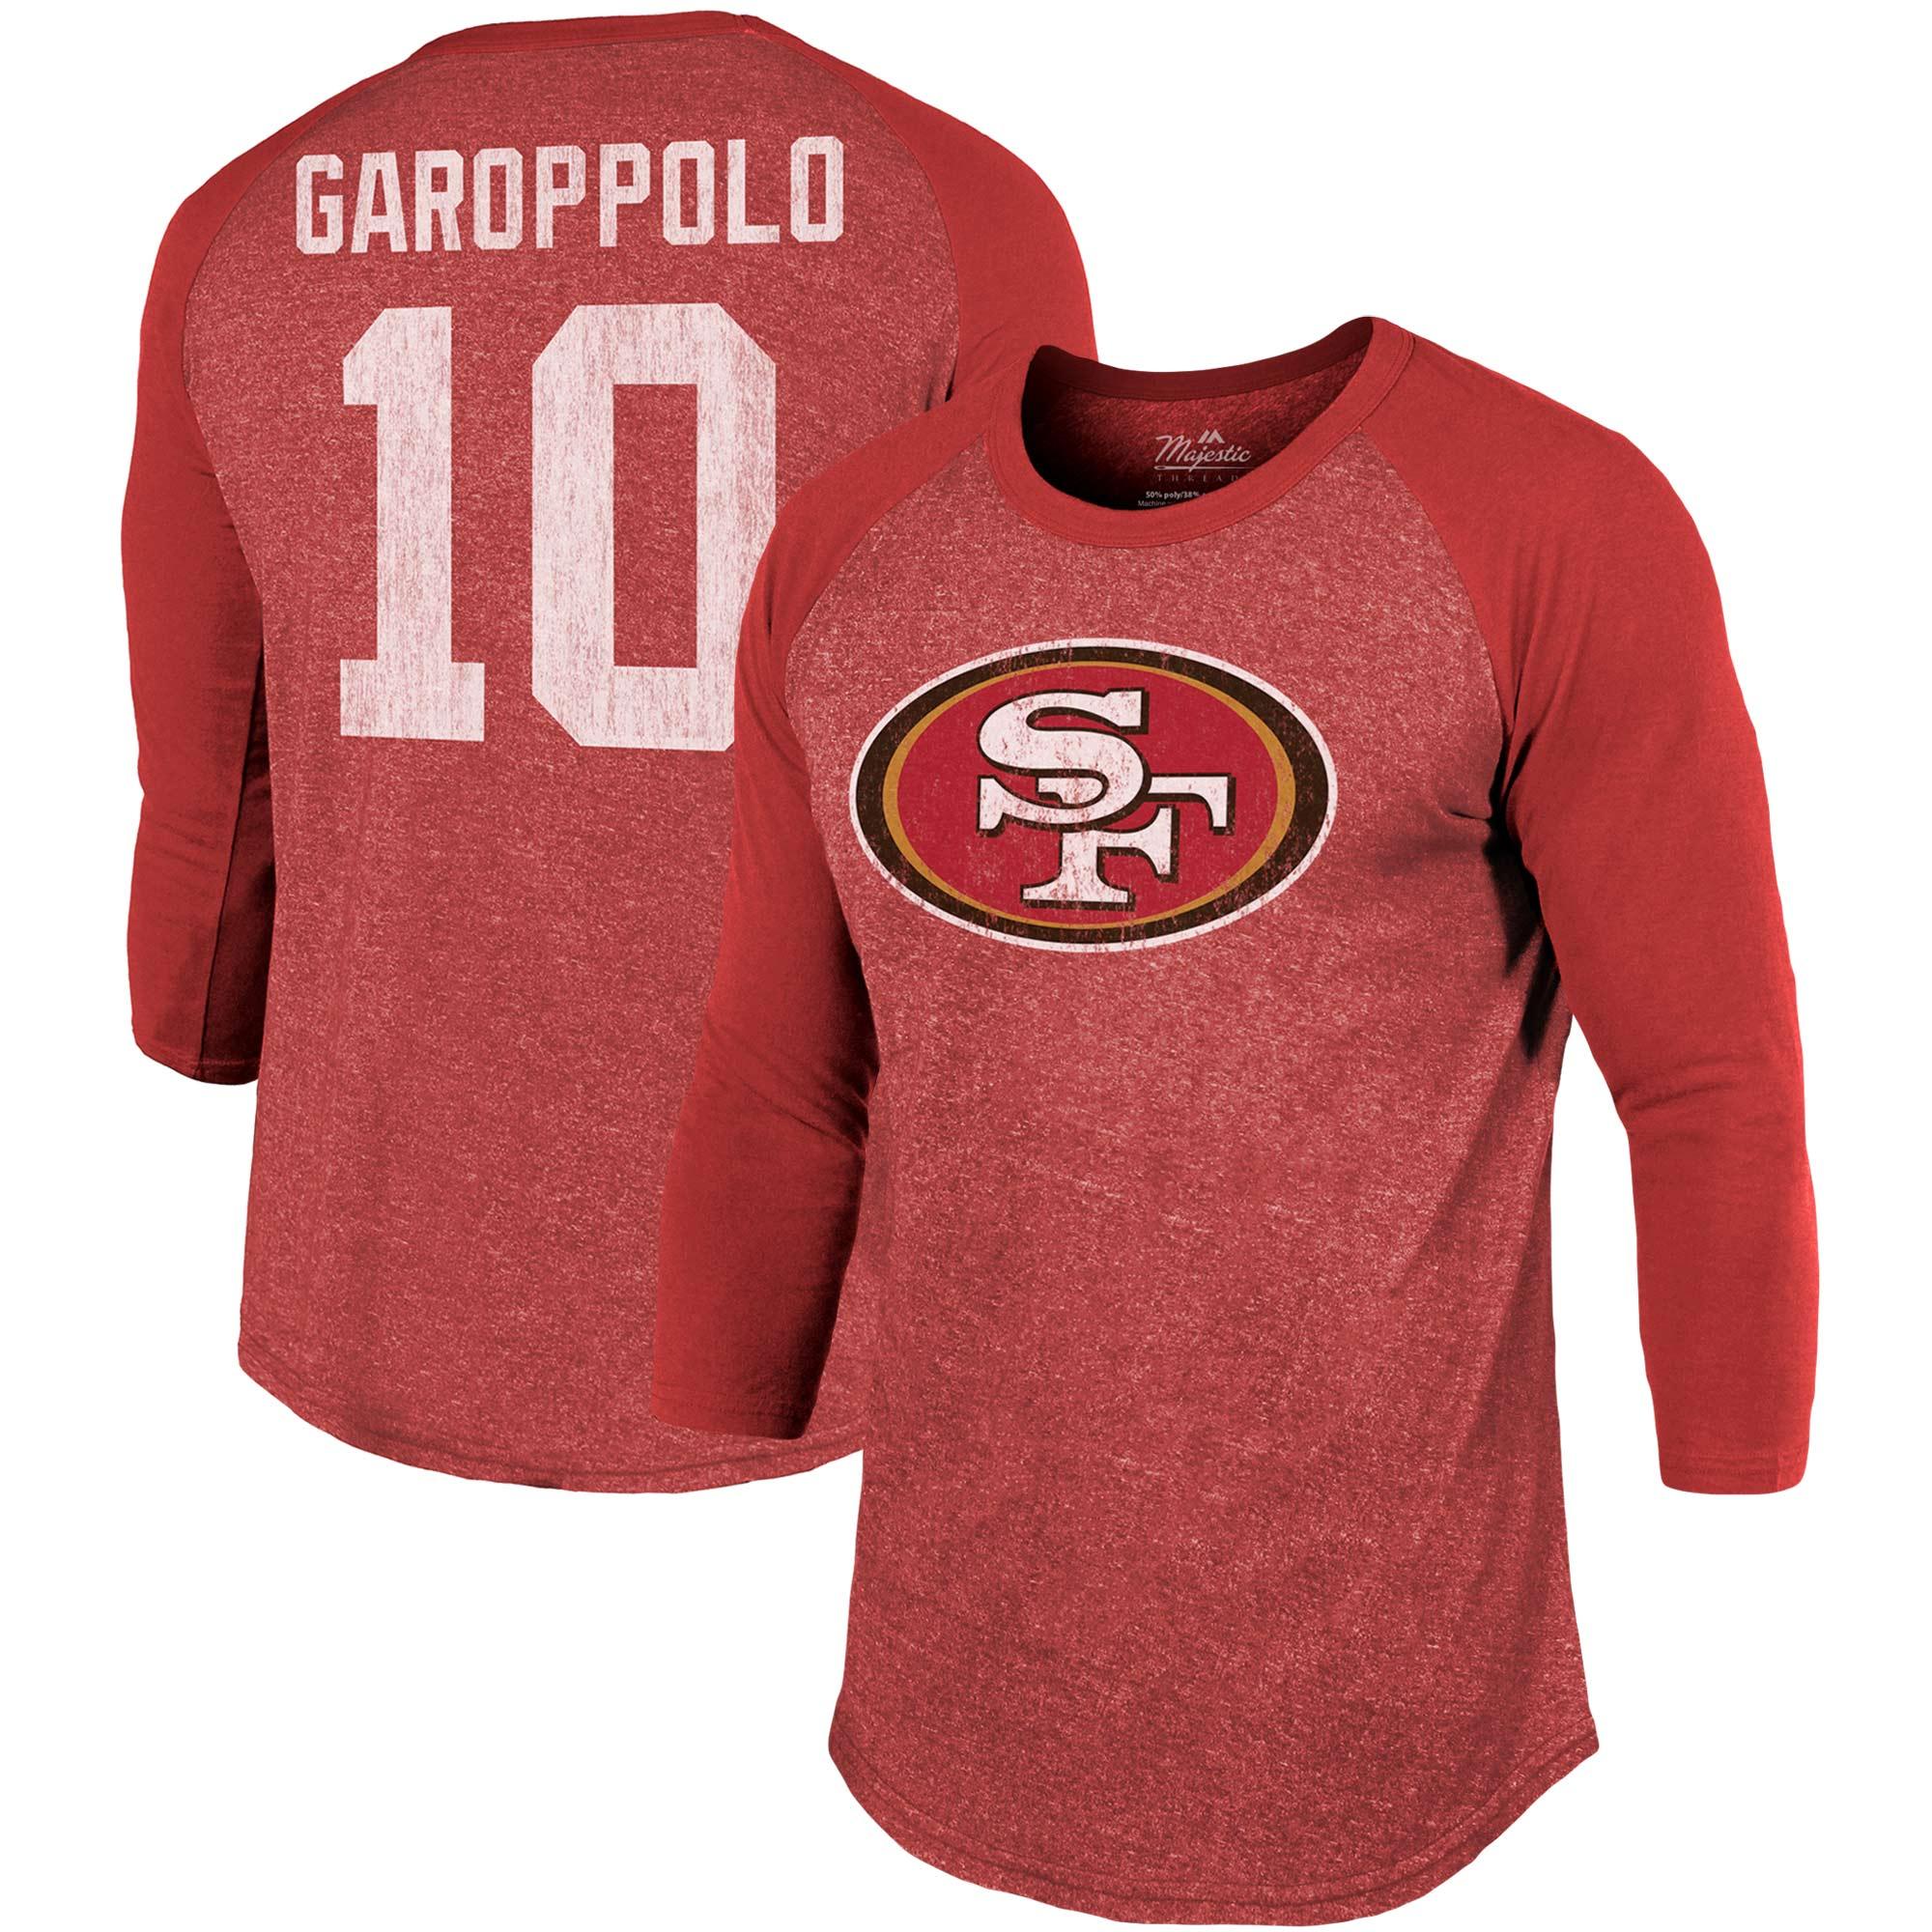 Jimmy Garoppolo San Francisco 49ers Majestic Threads Player Name & Number Tri-Blend 3/4-Sleeve Raglan T-Shirt - Scarlet